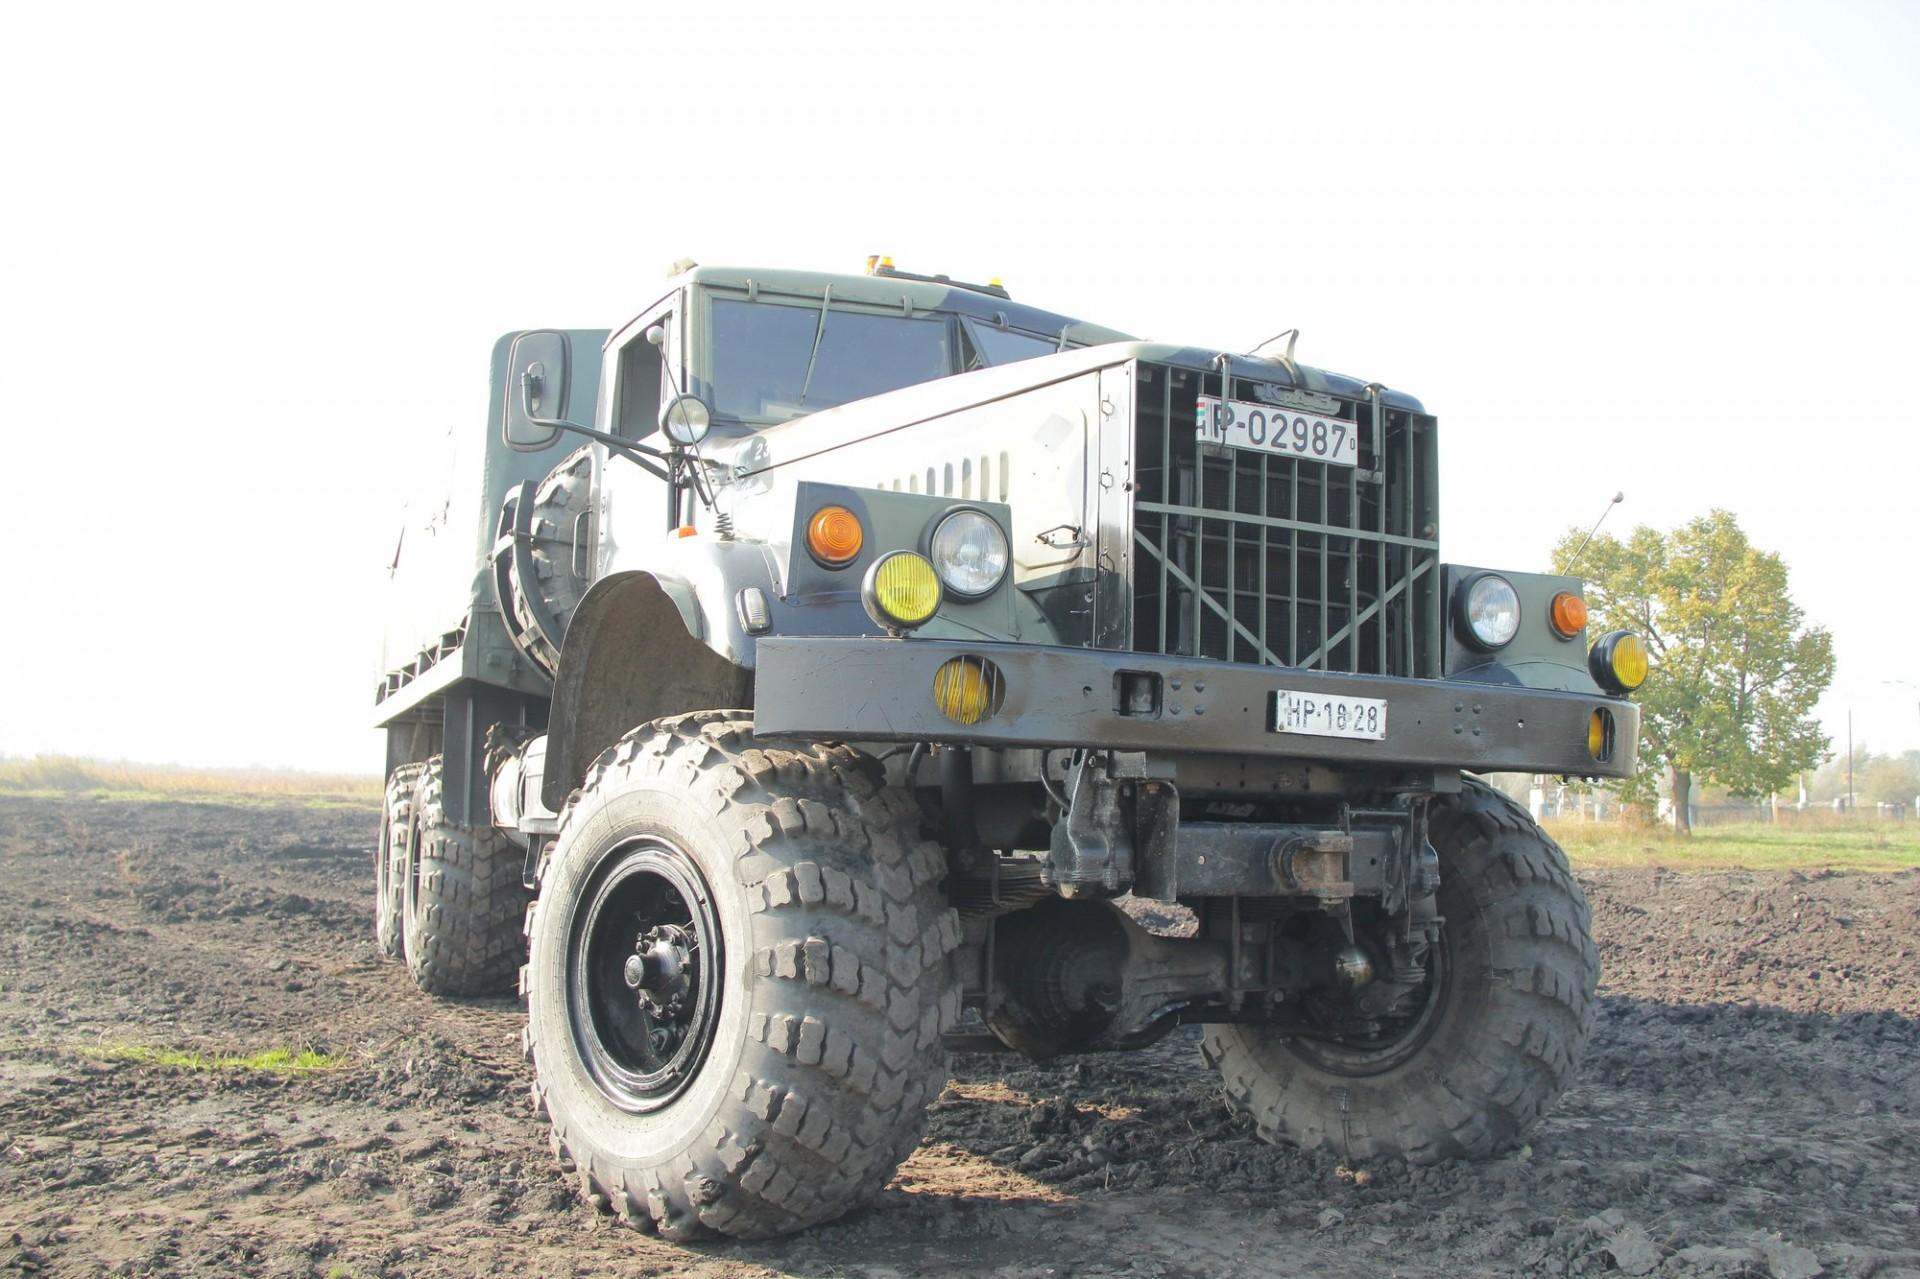 Used Trucks For Sale In Ky >> Military Technics :: Kraz 255 (open version)